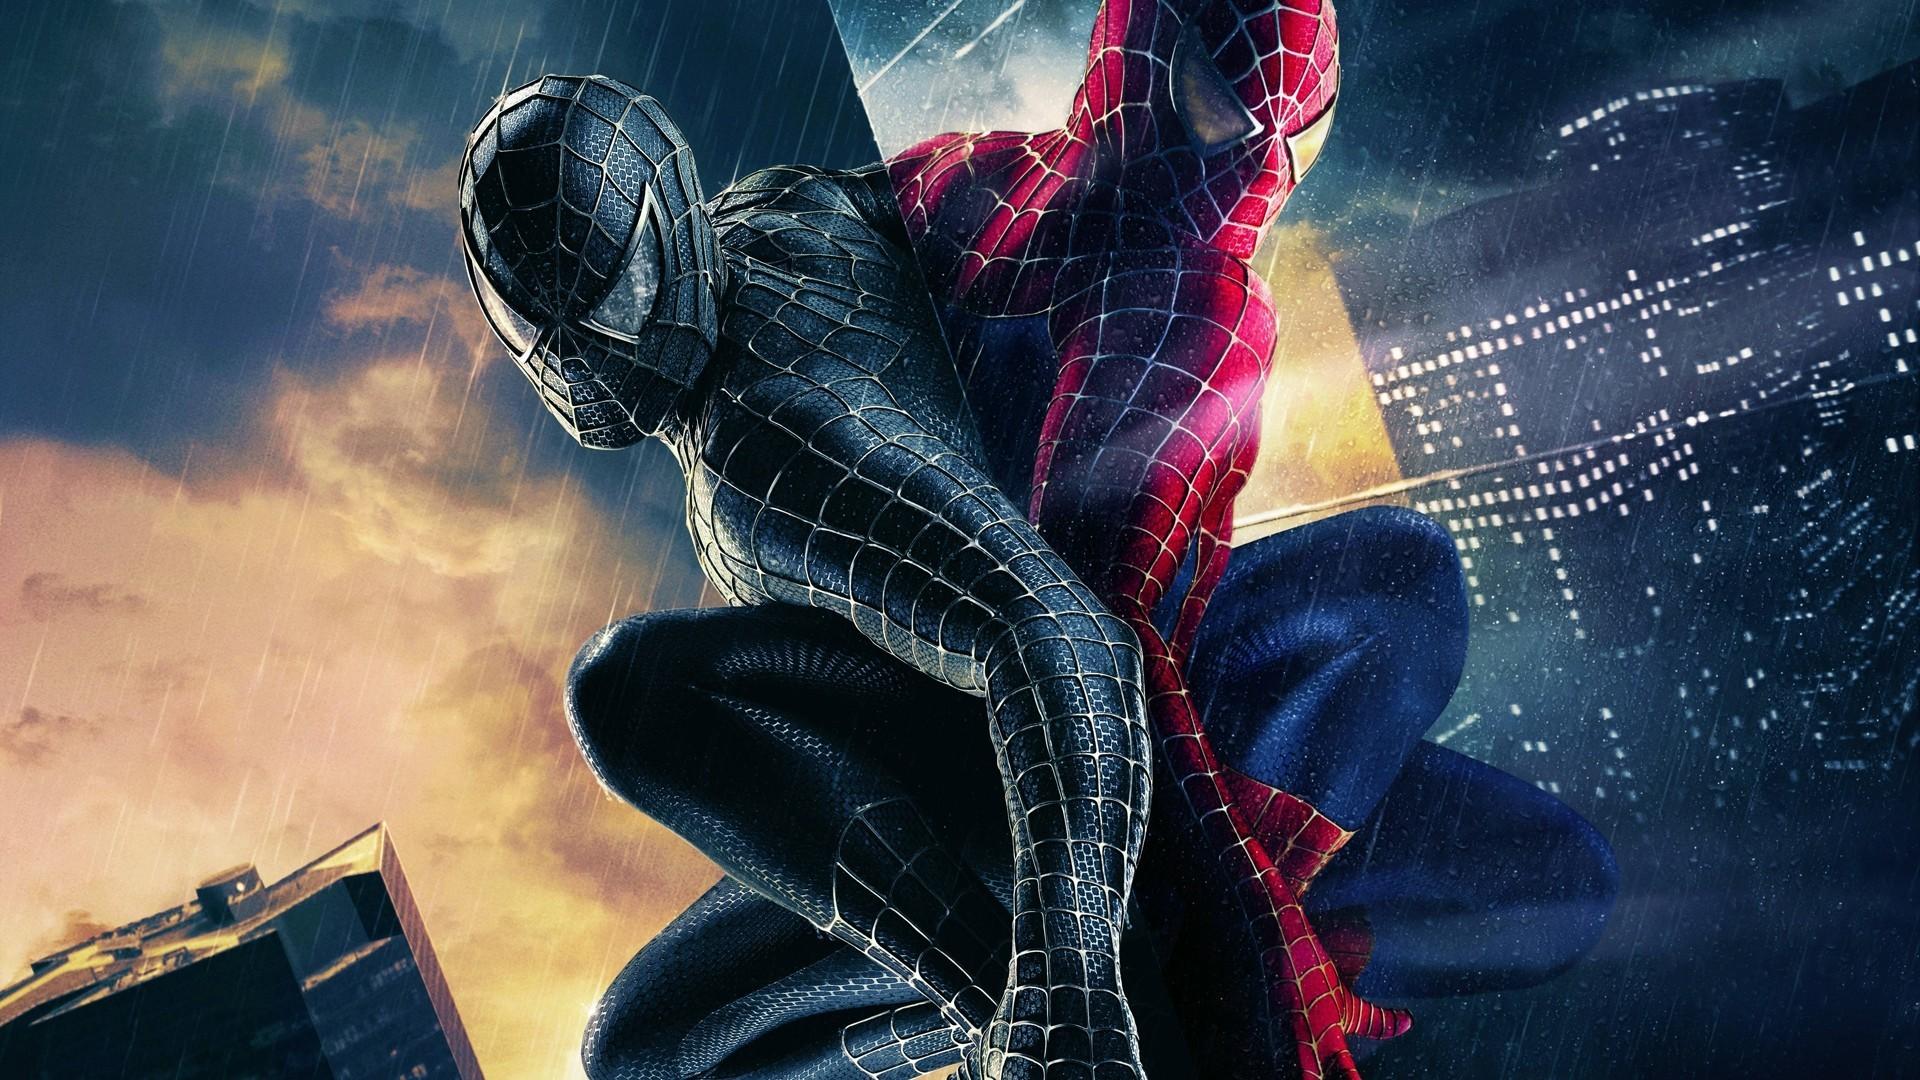 HD Black Spiderman Wallpaper 1080p Full Size – HiReWallpapers 10556